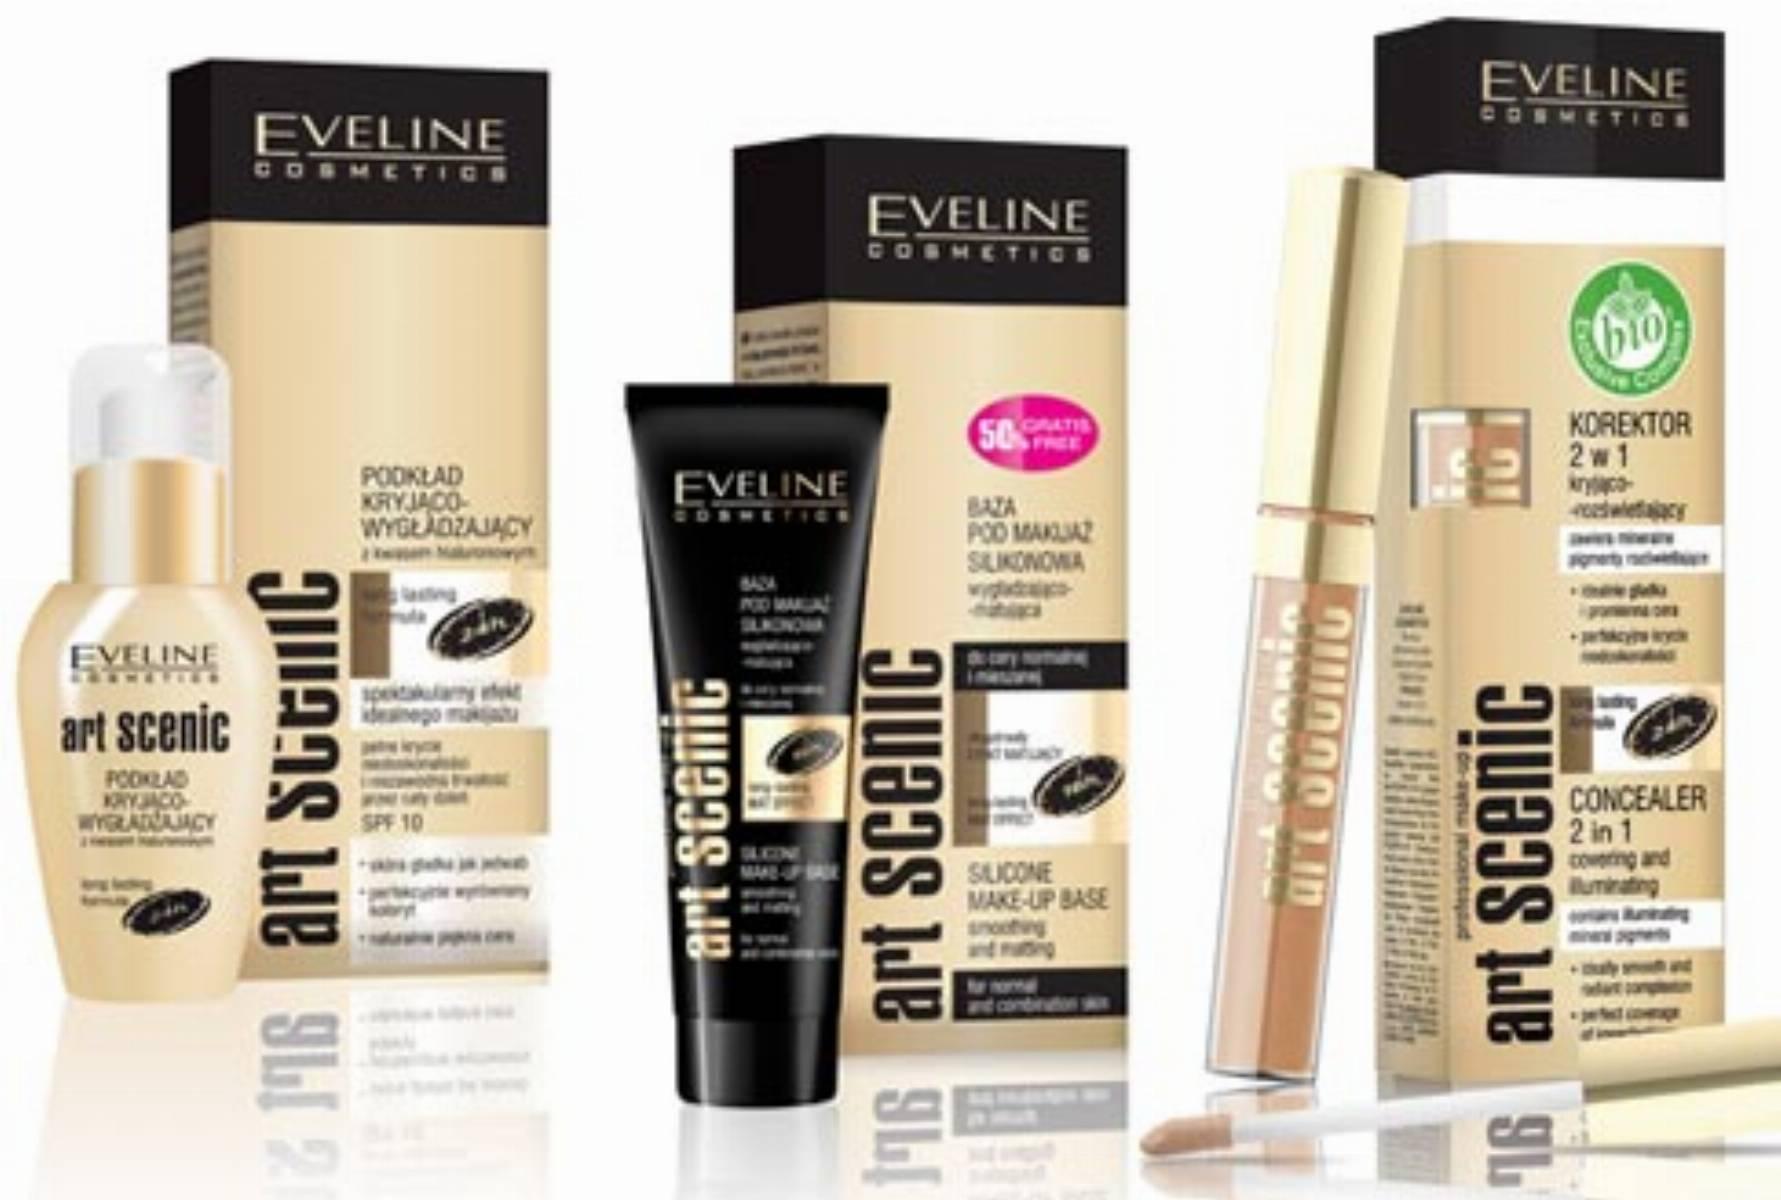 Eveline Cosmetics - seria Art. Scenic